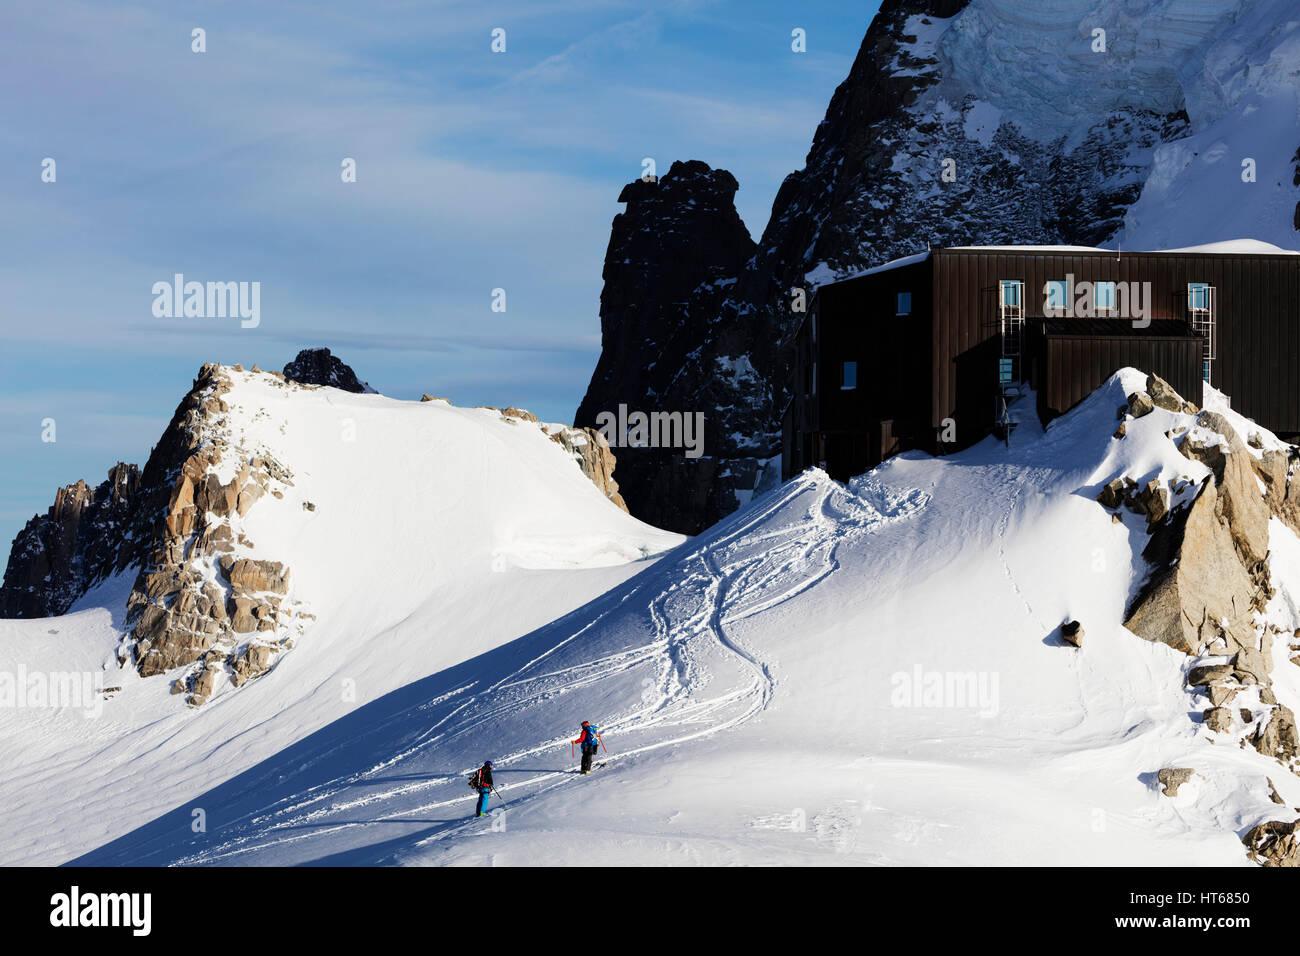 Grand Capucin and Refuge des Cosmiques (Cosmiques Hut), Chamonix, Rhone Alpes, Haute Savoie, French Alps, France - Stock Image